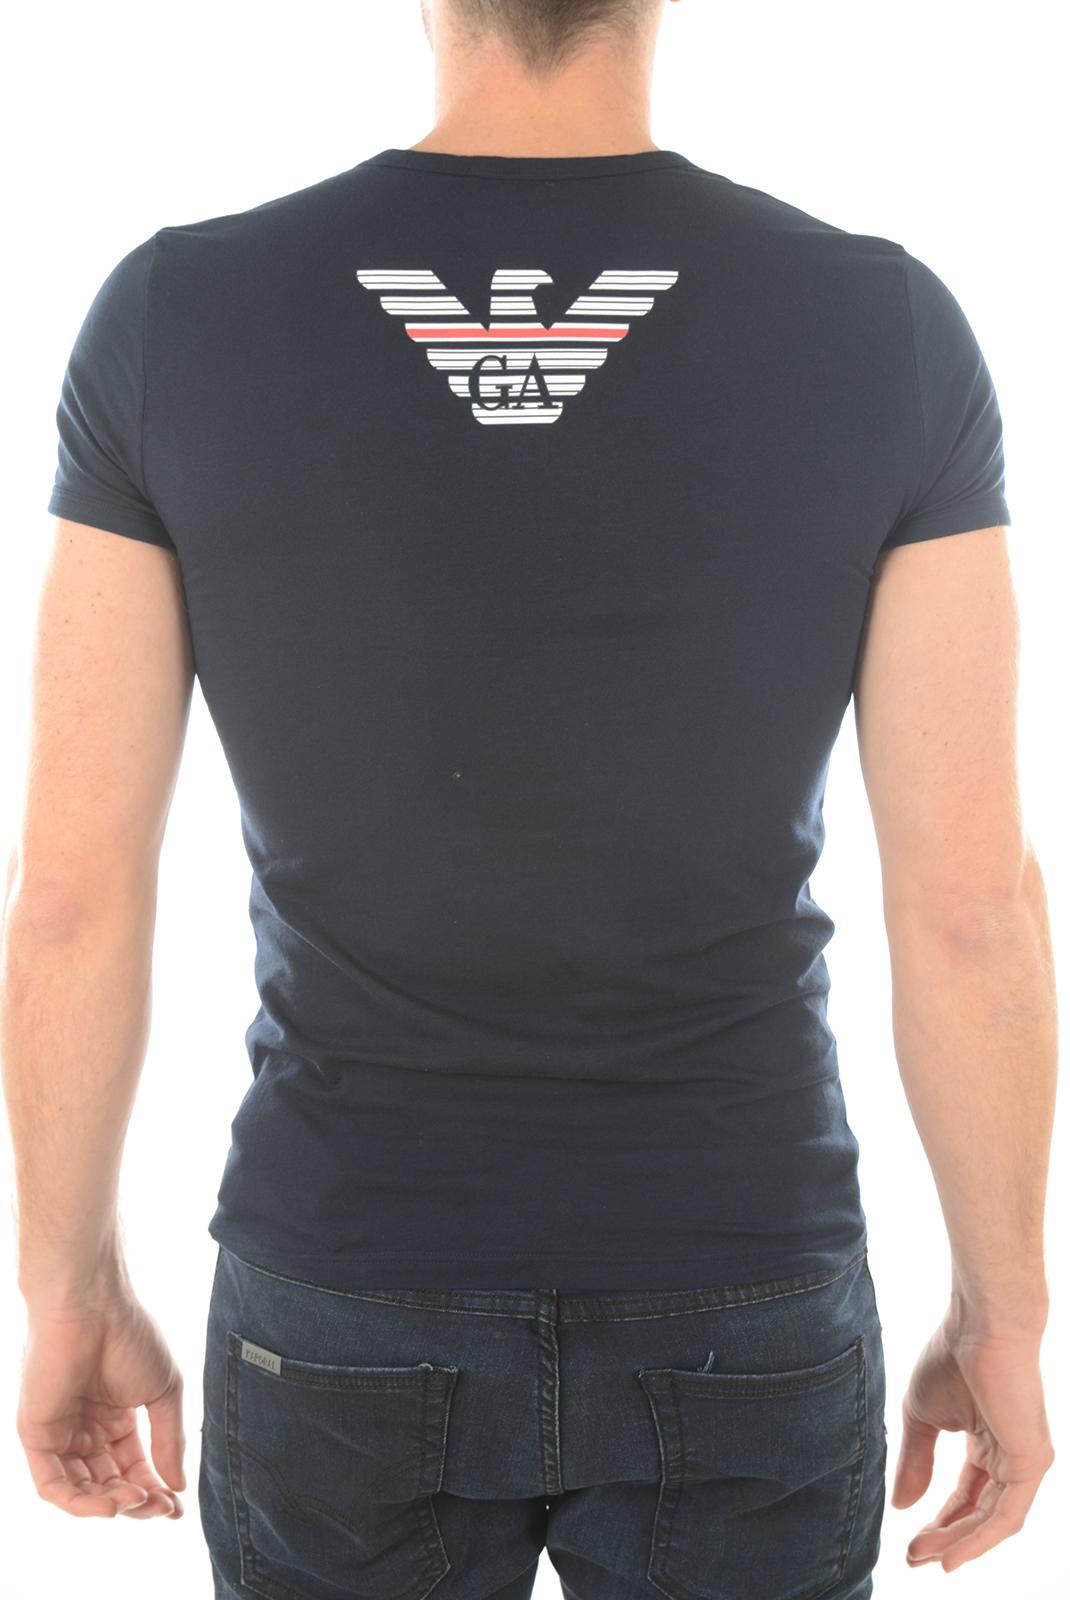 Tee-shirts manches courtes  Emporio armani 110810 6P725 135 marine